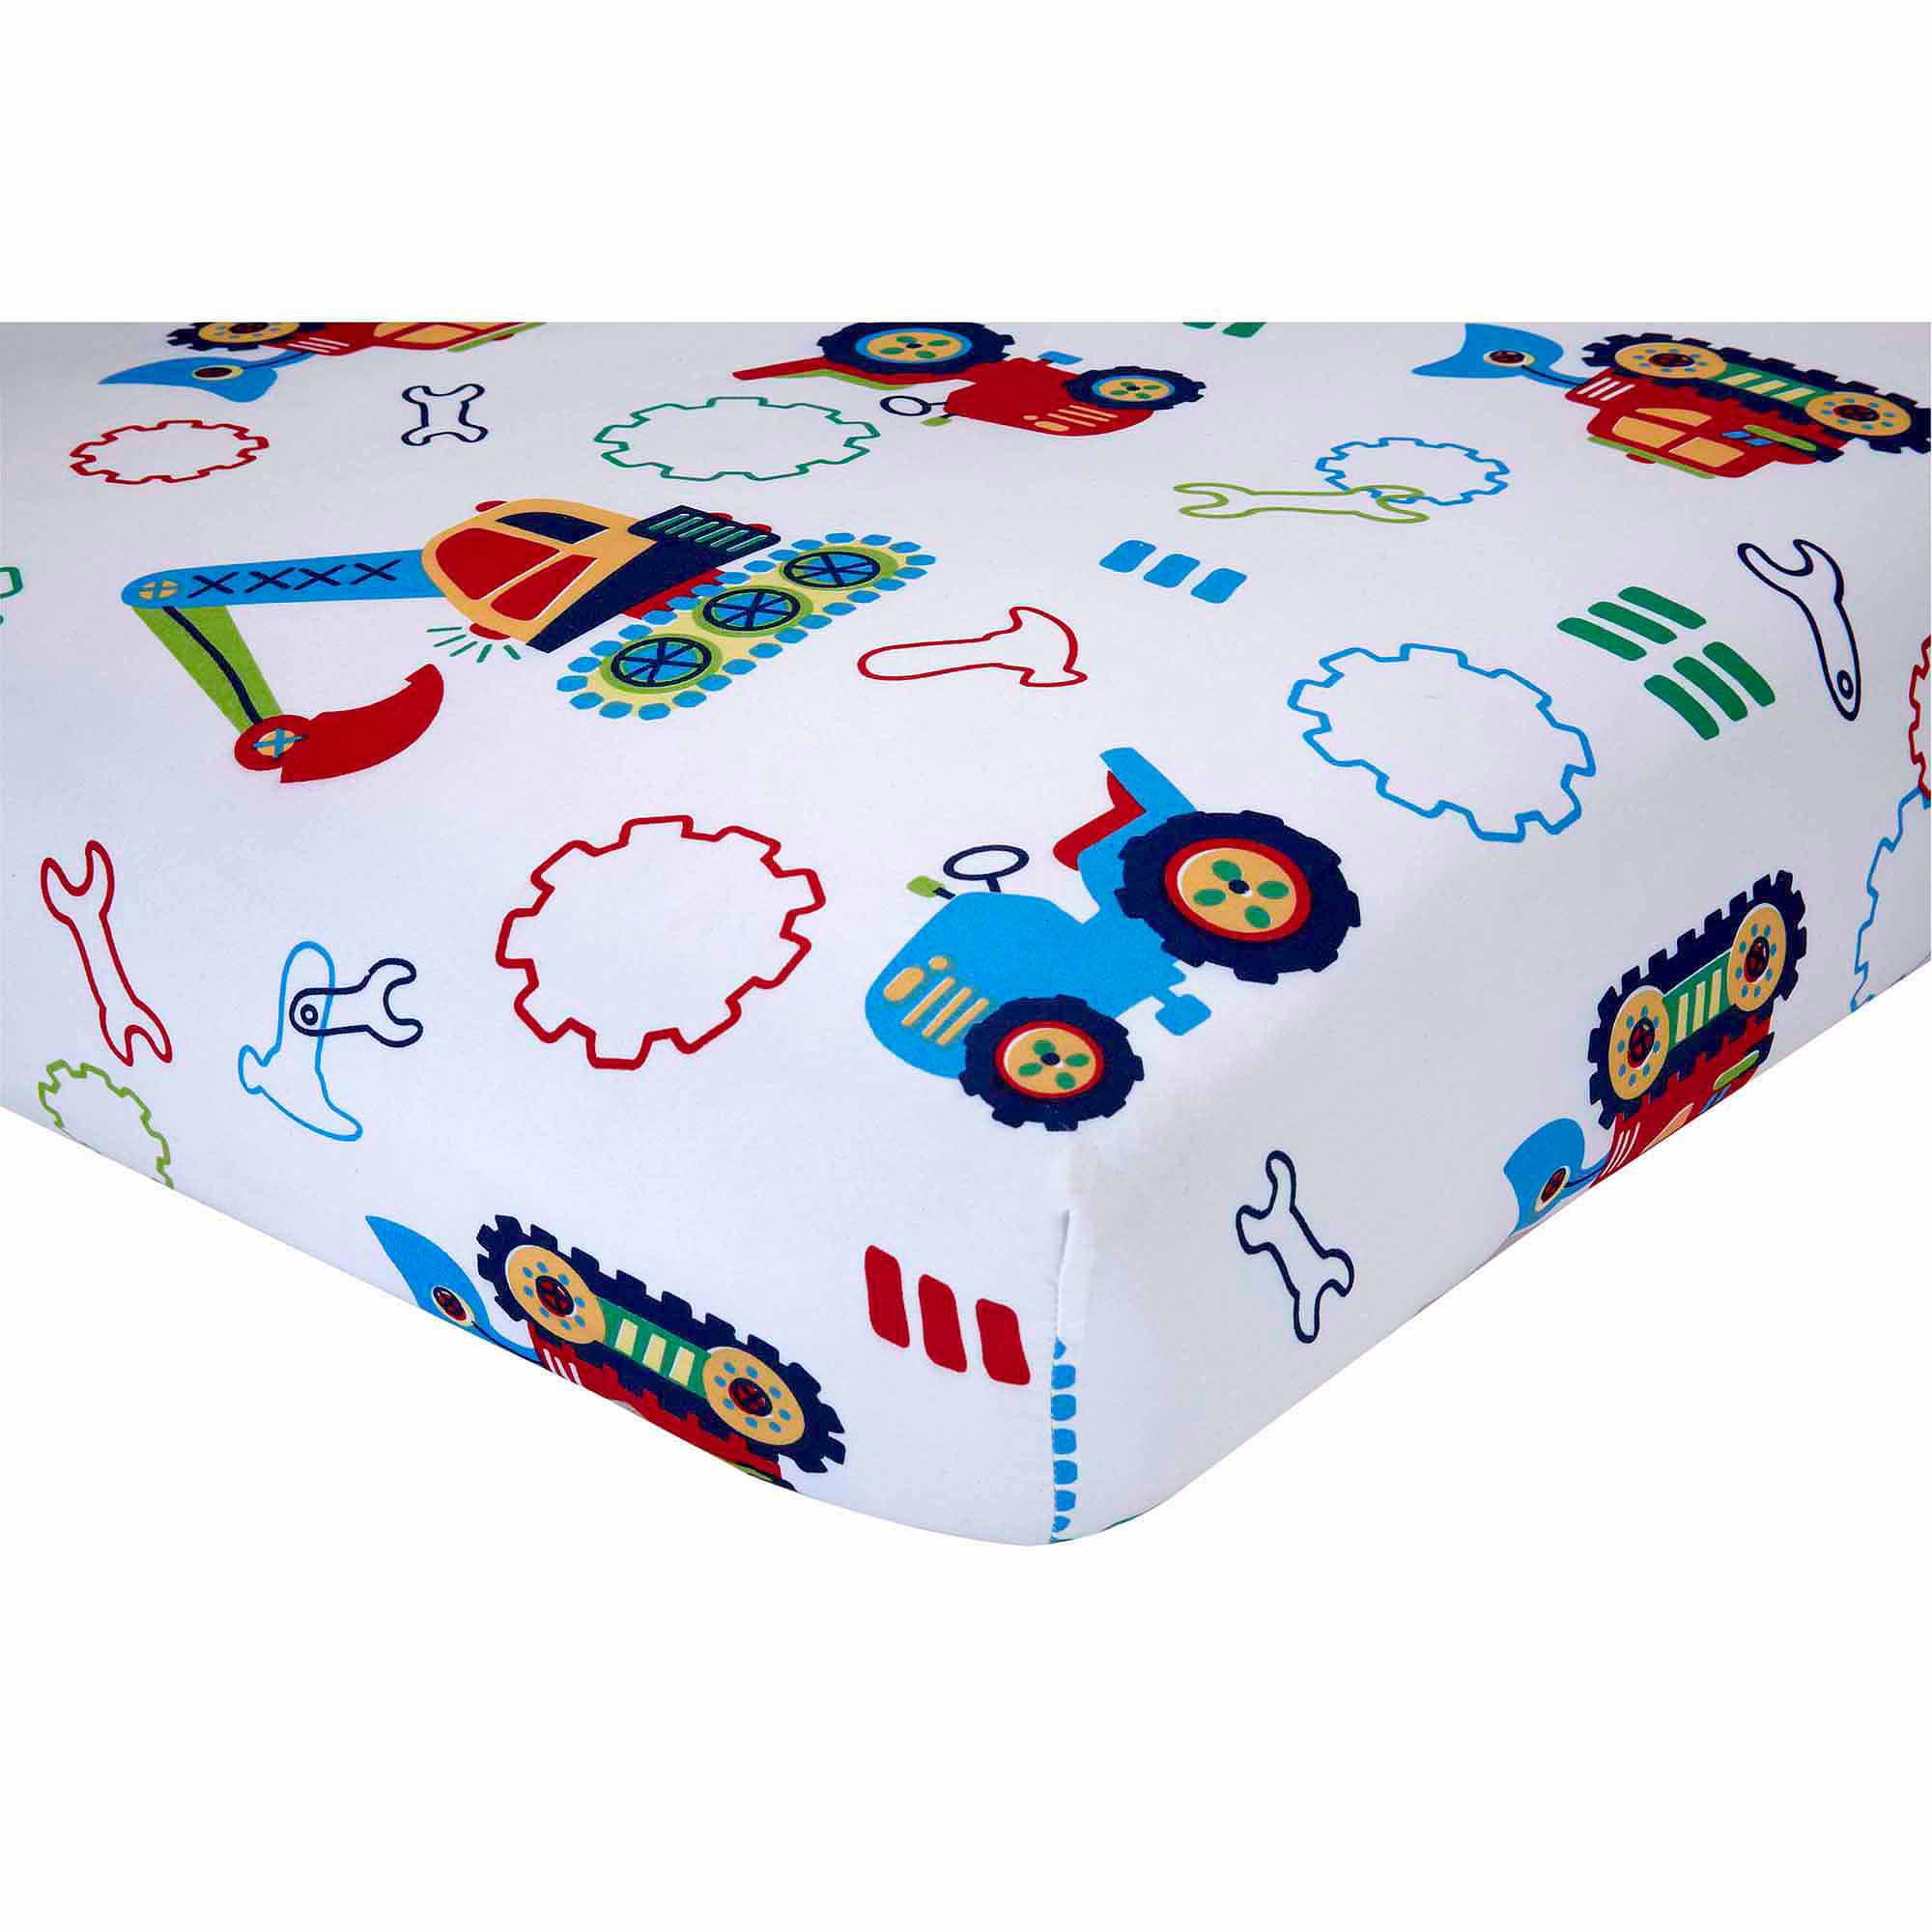 Everything Kids Under Construction 3 Piece Toddler Bedding Set With BONUS  Matching Pillow Case   Walmart.com